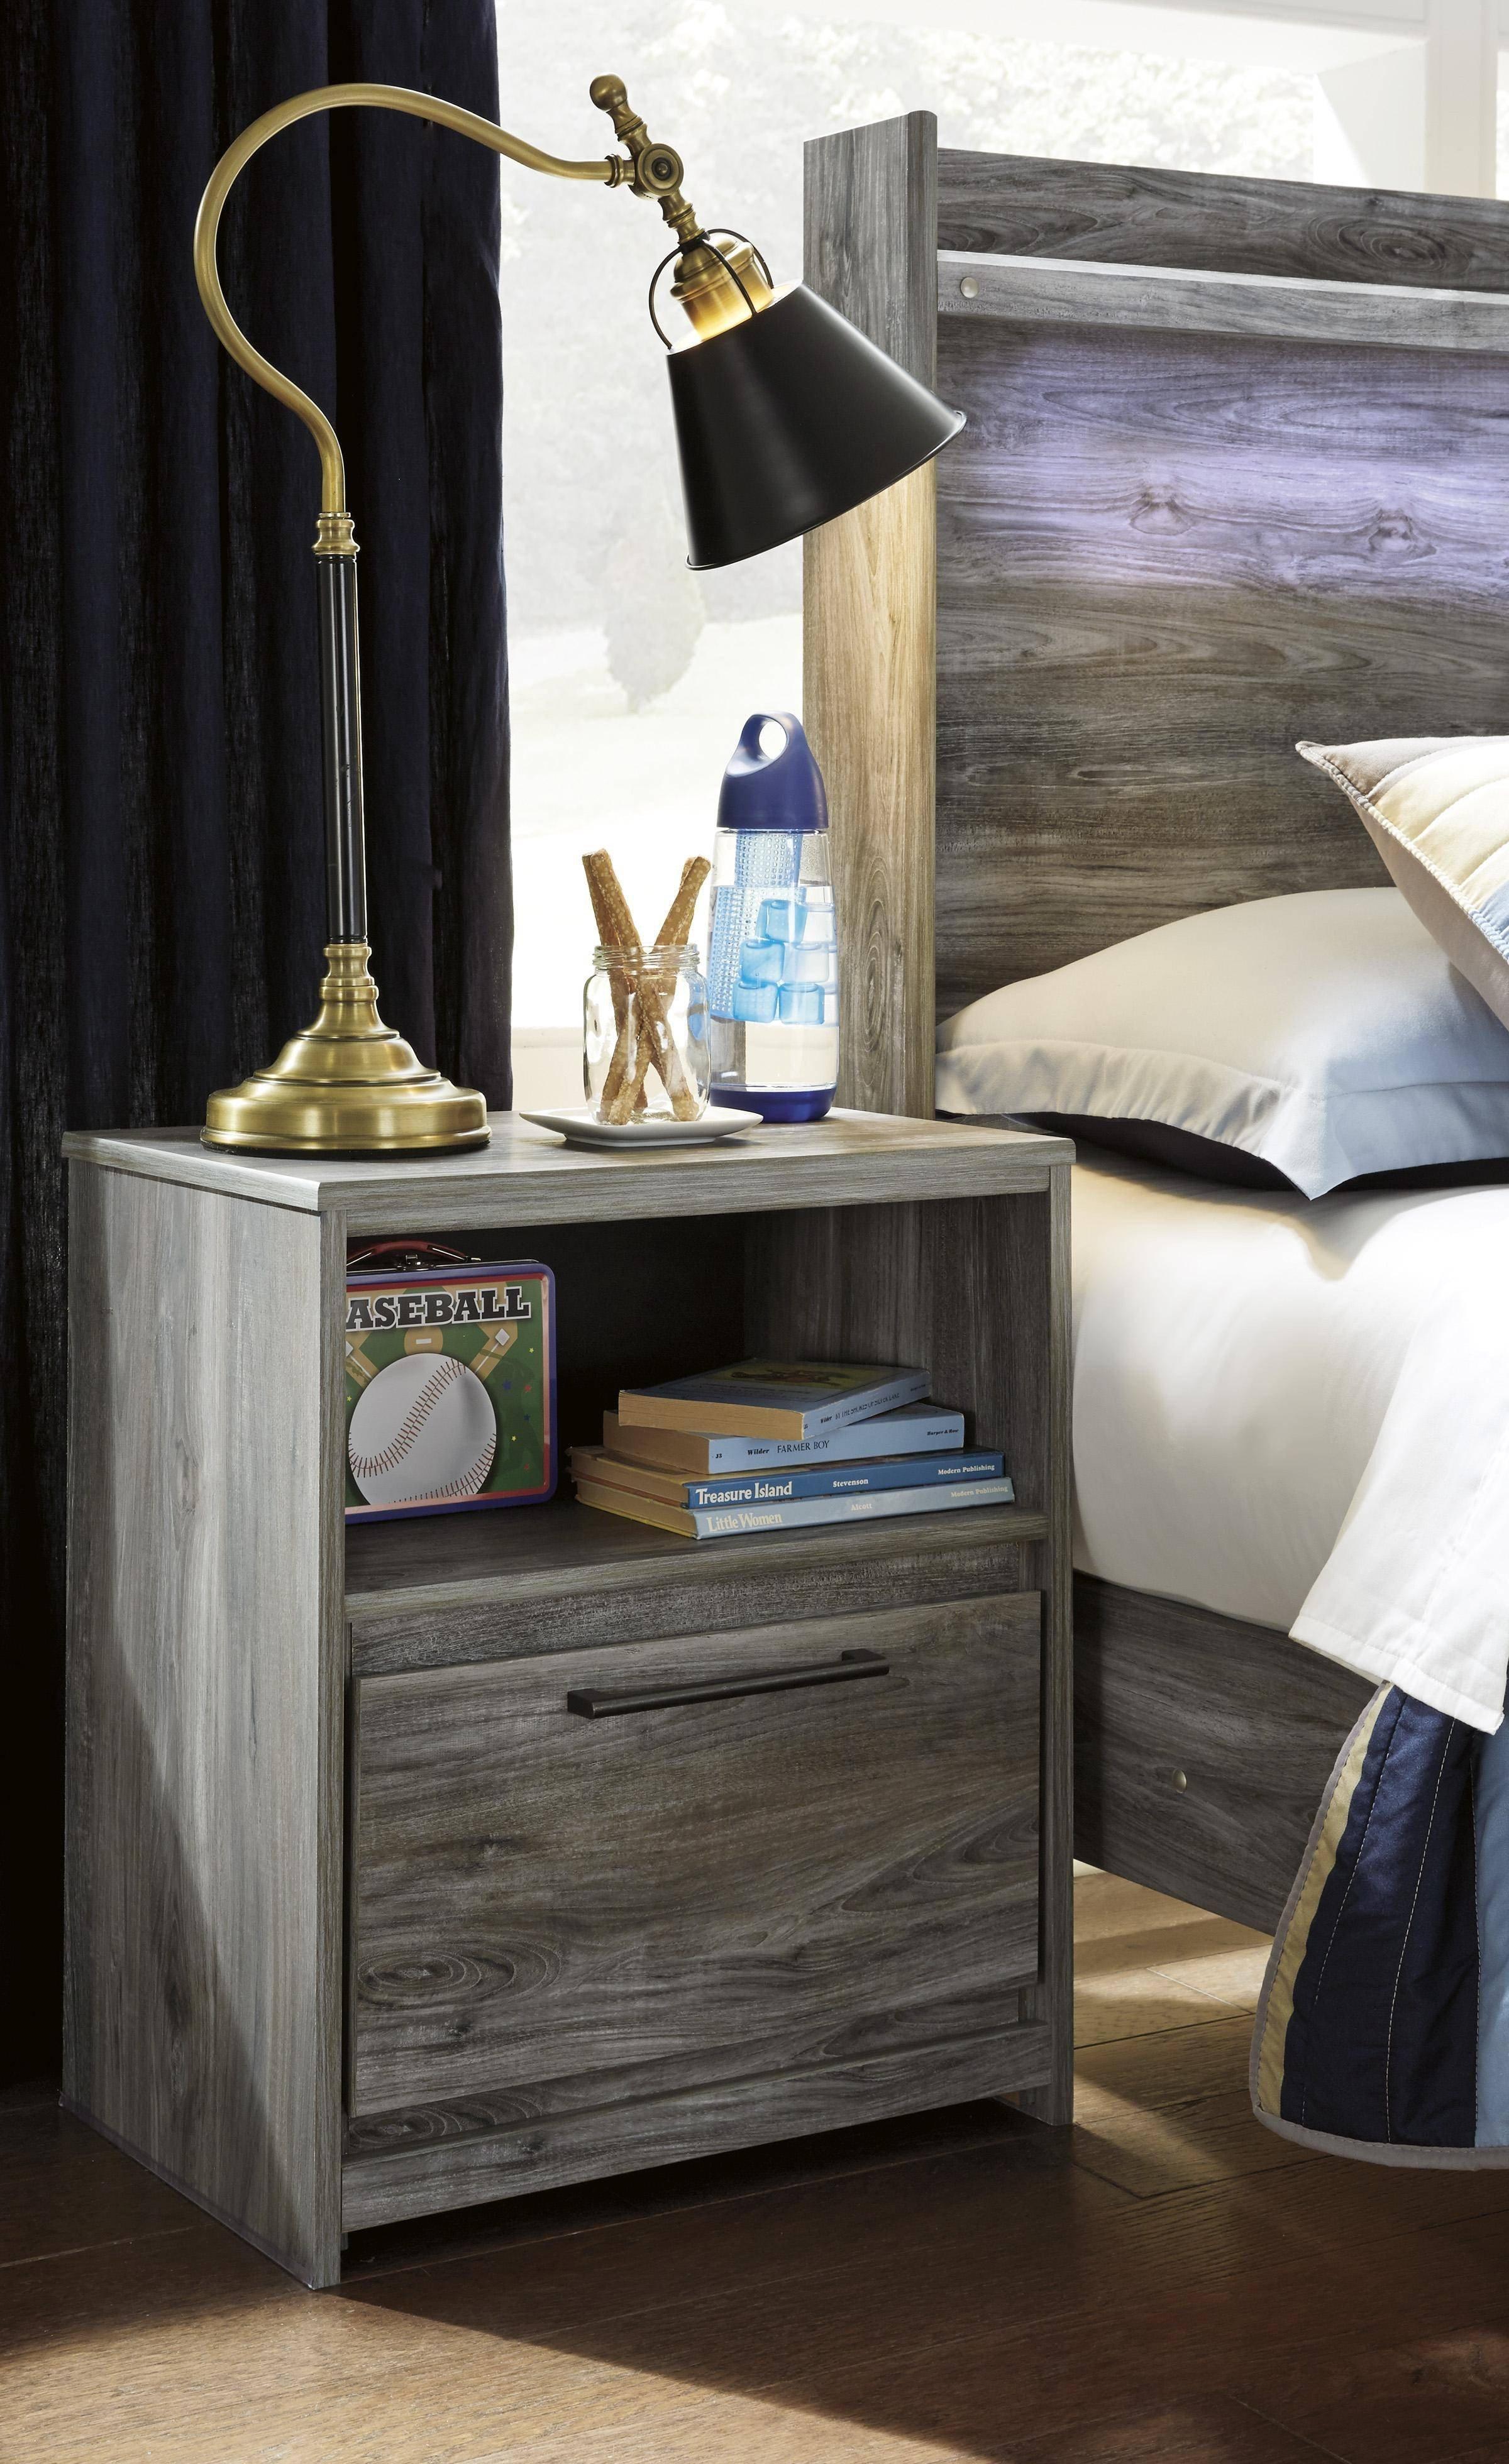 King Size Canopy Bedroom Set Beautiful ashley Baystorm B221 King Size Canopy Bedroom Set 5pcs In